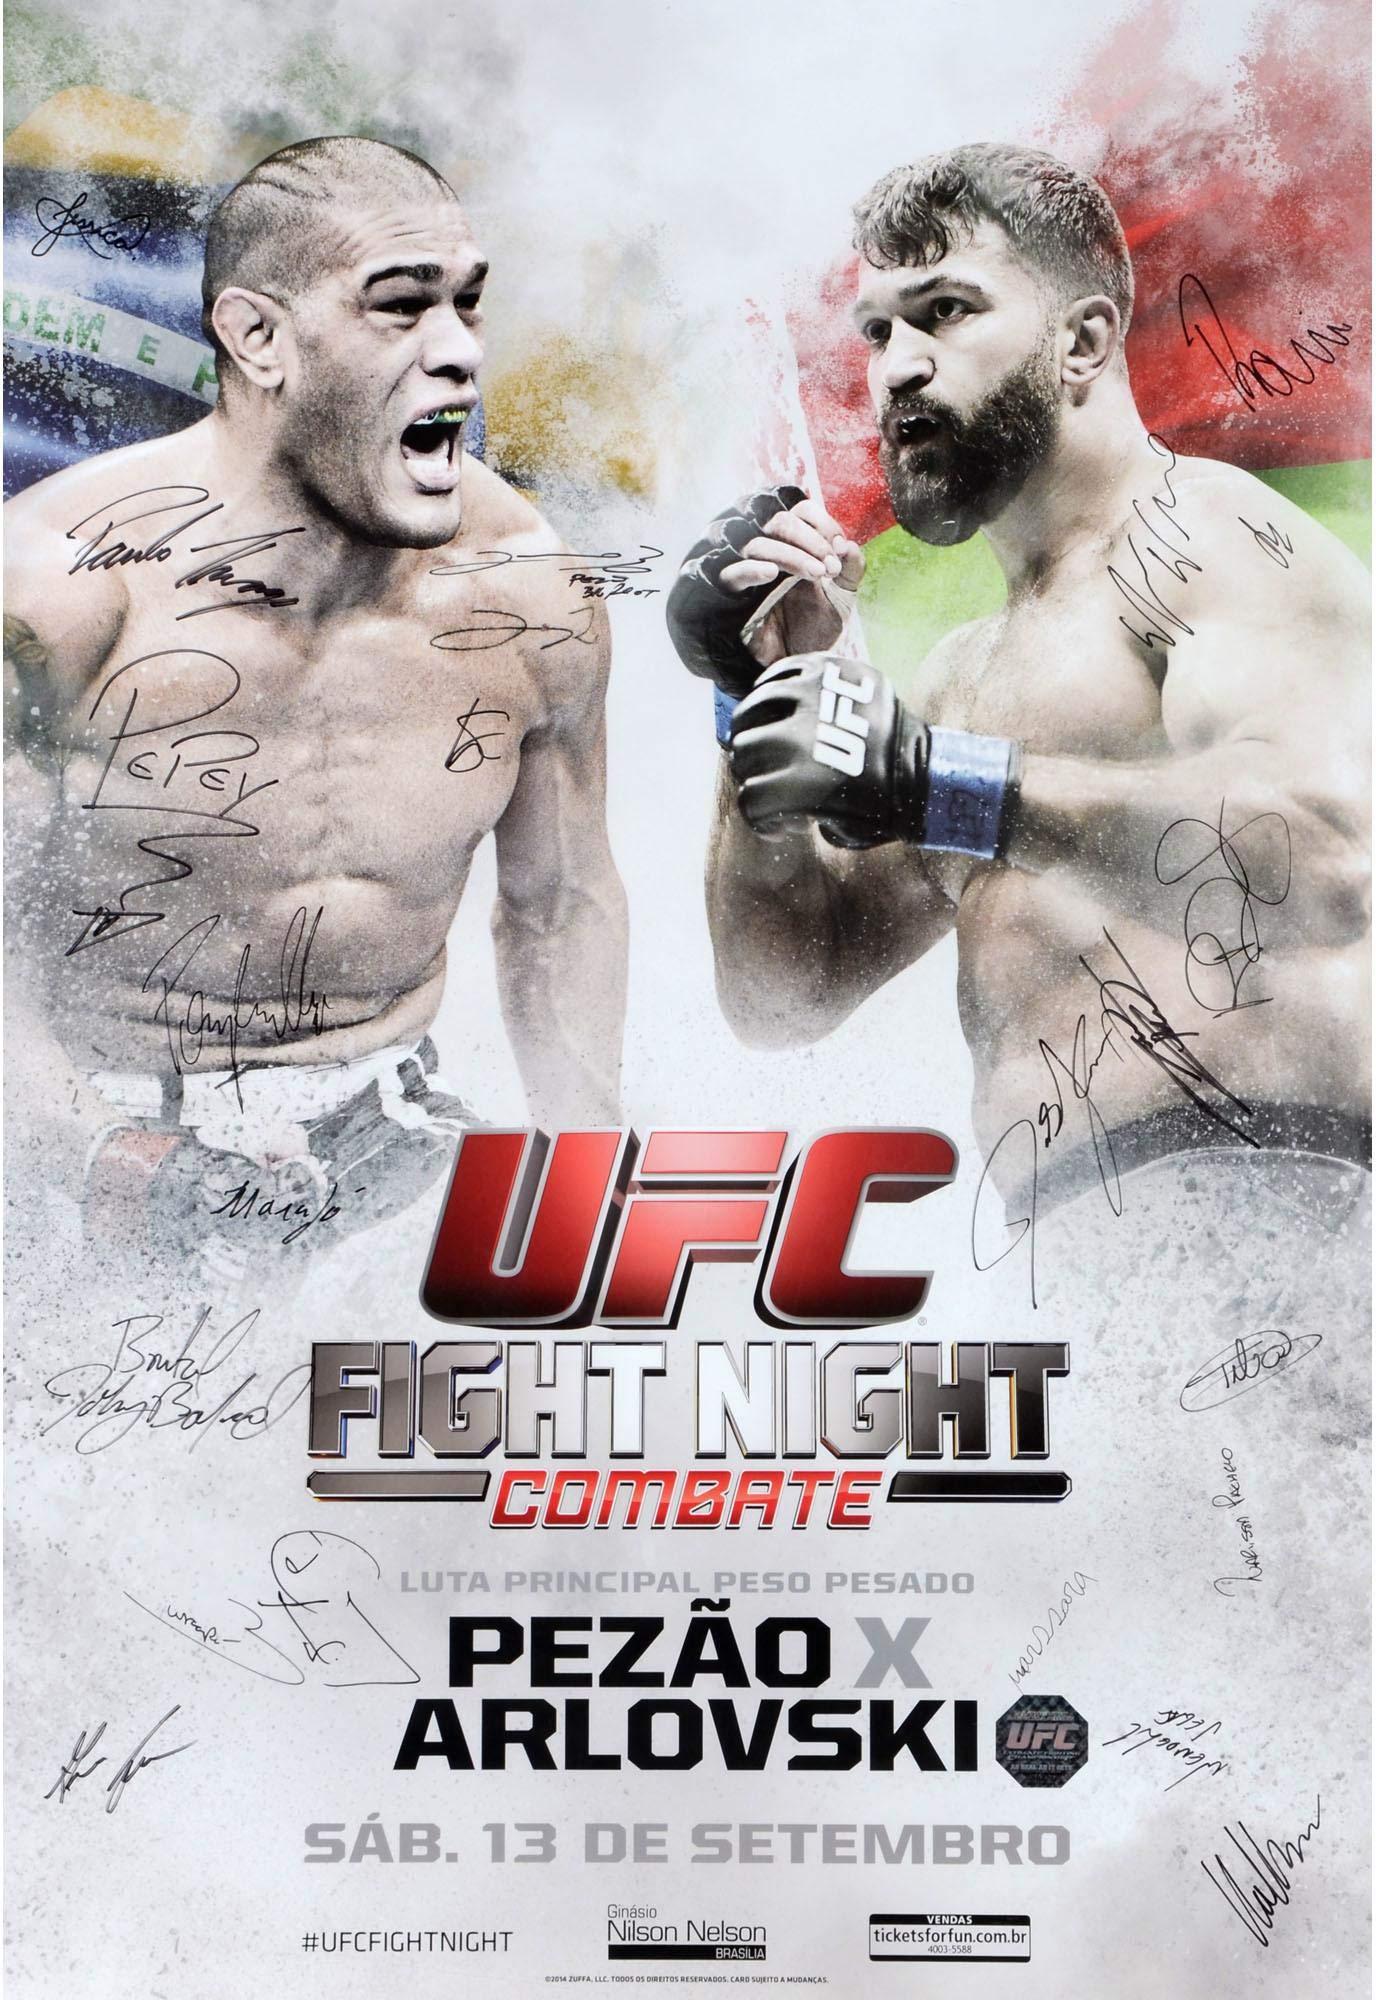 "UFC Fight Night 51 Bigfoot vs. Arlovski Autographed 27"" x 39"" 22 Signature Event Poster Fanatics Authentic Certified"